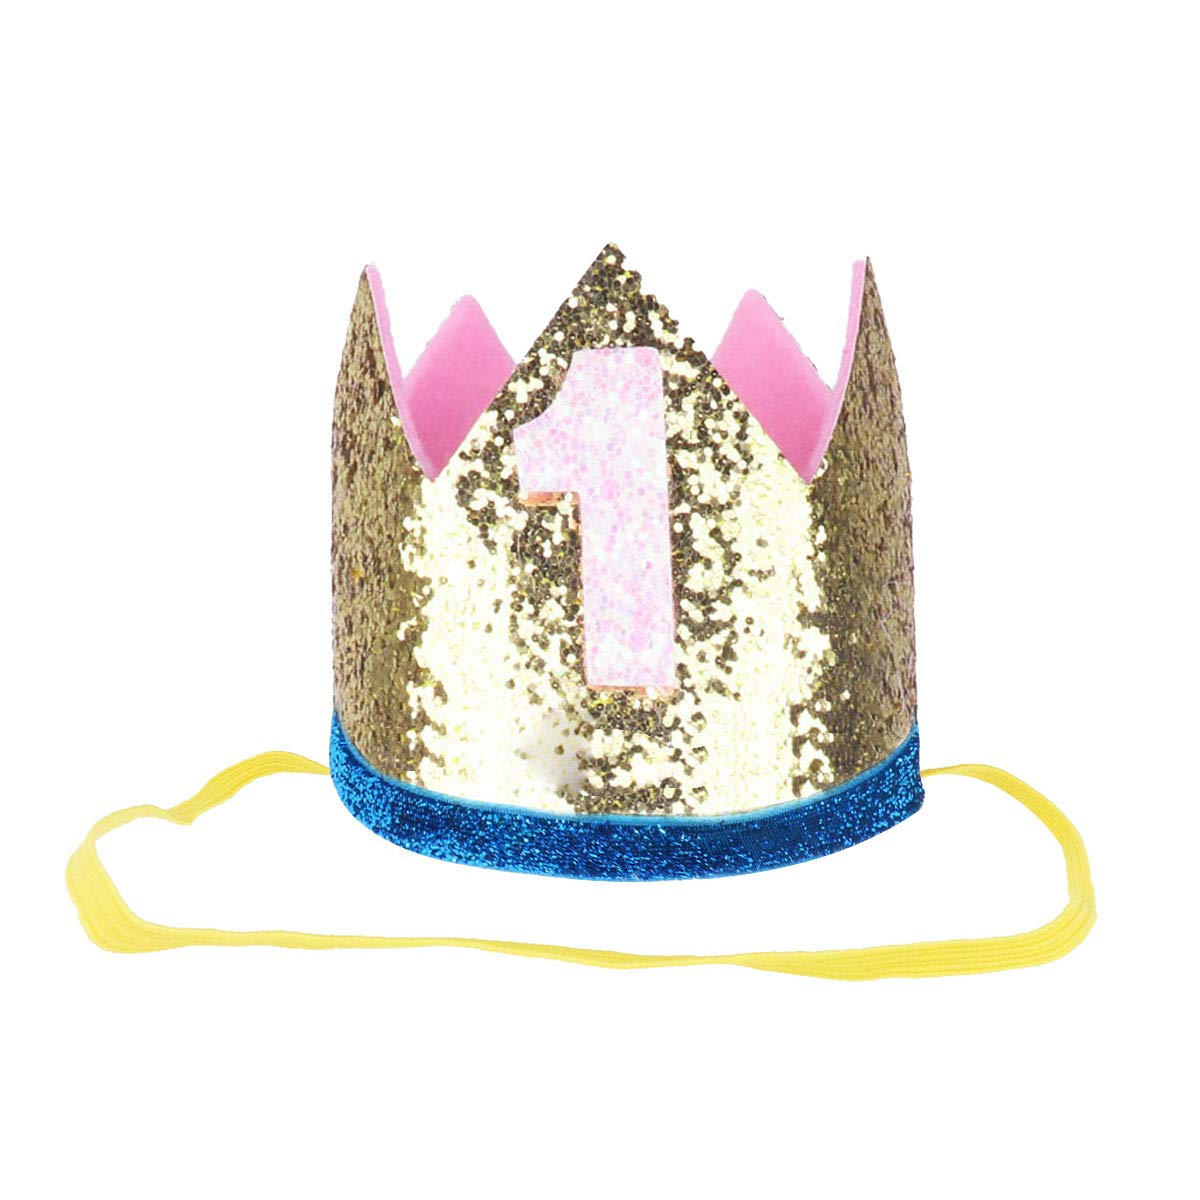 iiniim Baby Girls Boys First /1st Birthday Party Hat Little Prince Crown Headband Head wear Accessories Gold Number 1 One Size by iiniim (Image #1)